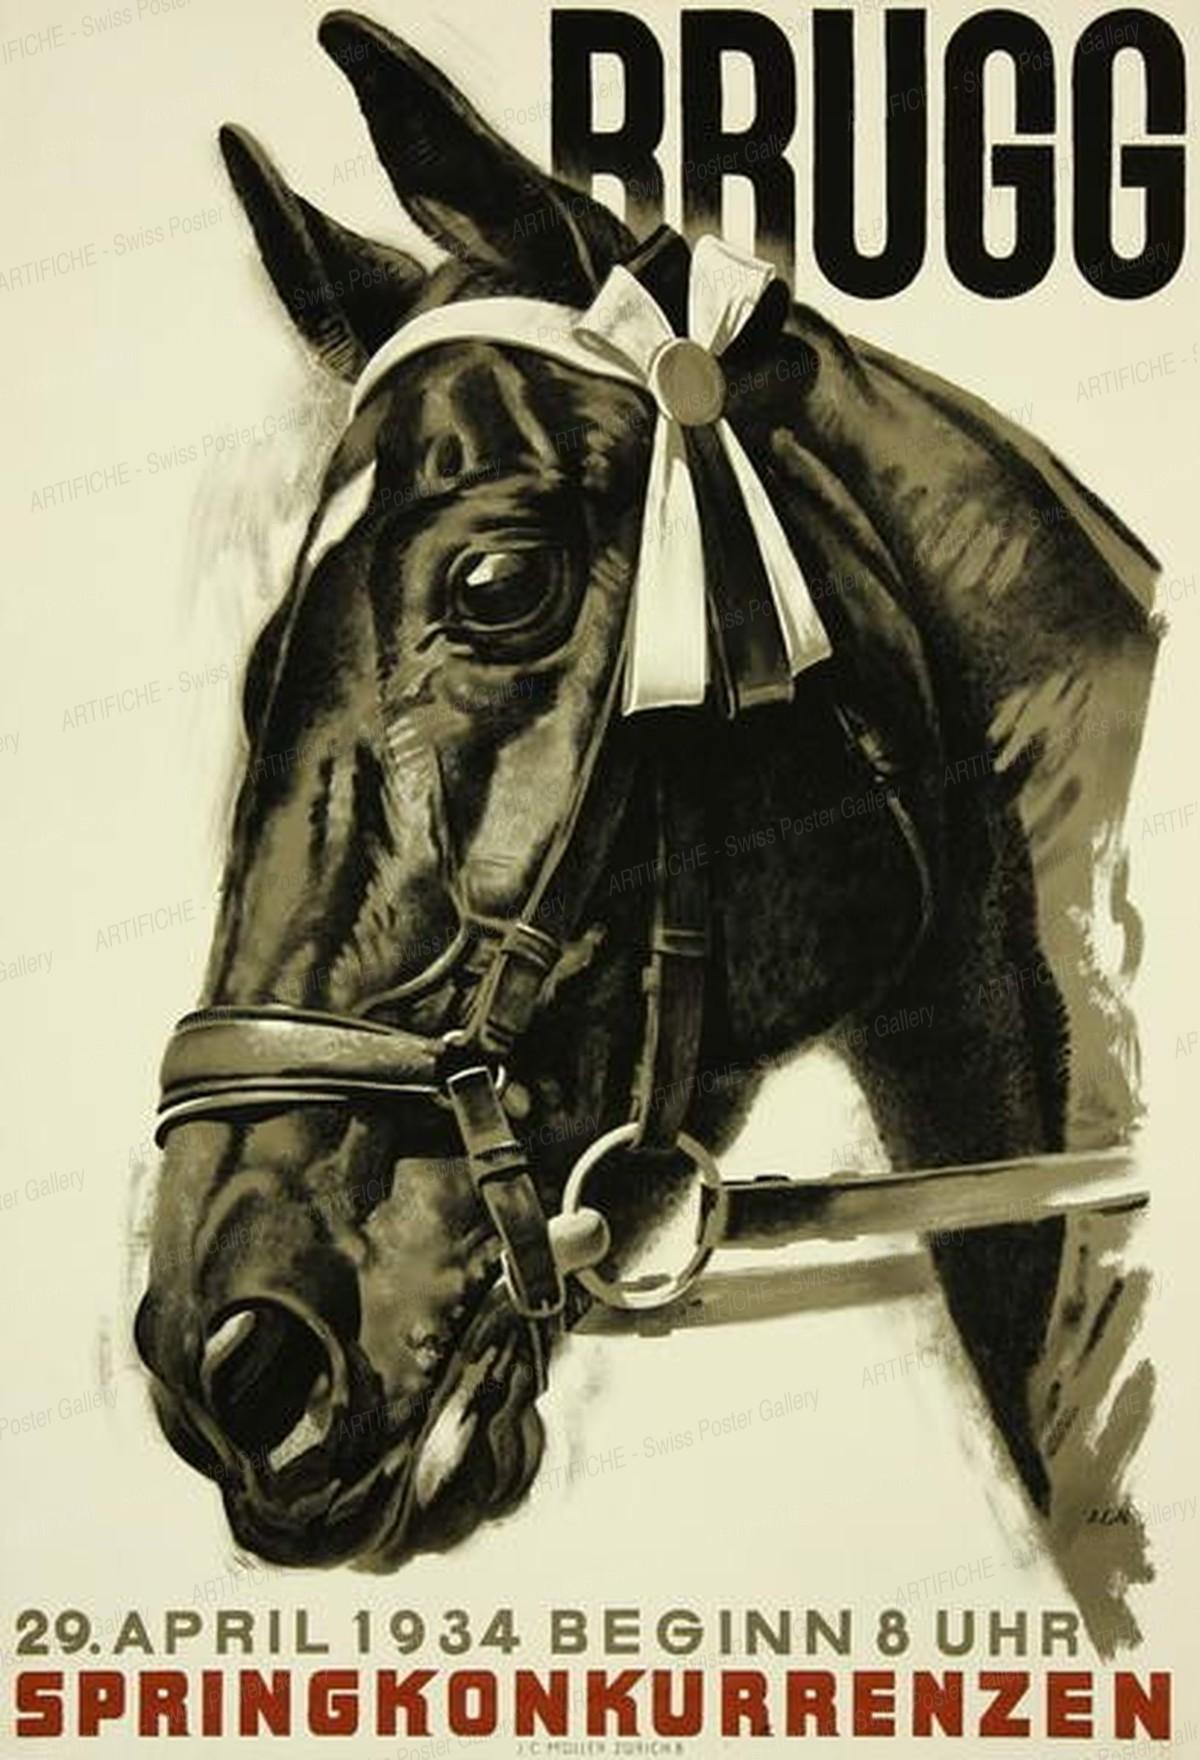 BRUGG – Springkonkurrenzen 1934, Iwan Edwin Hugentobler